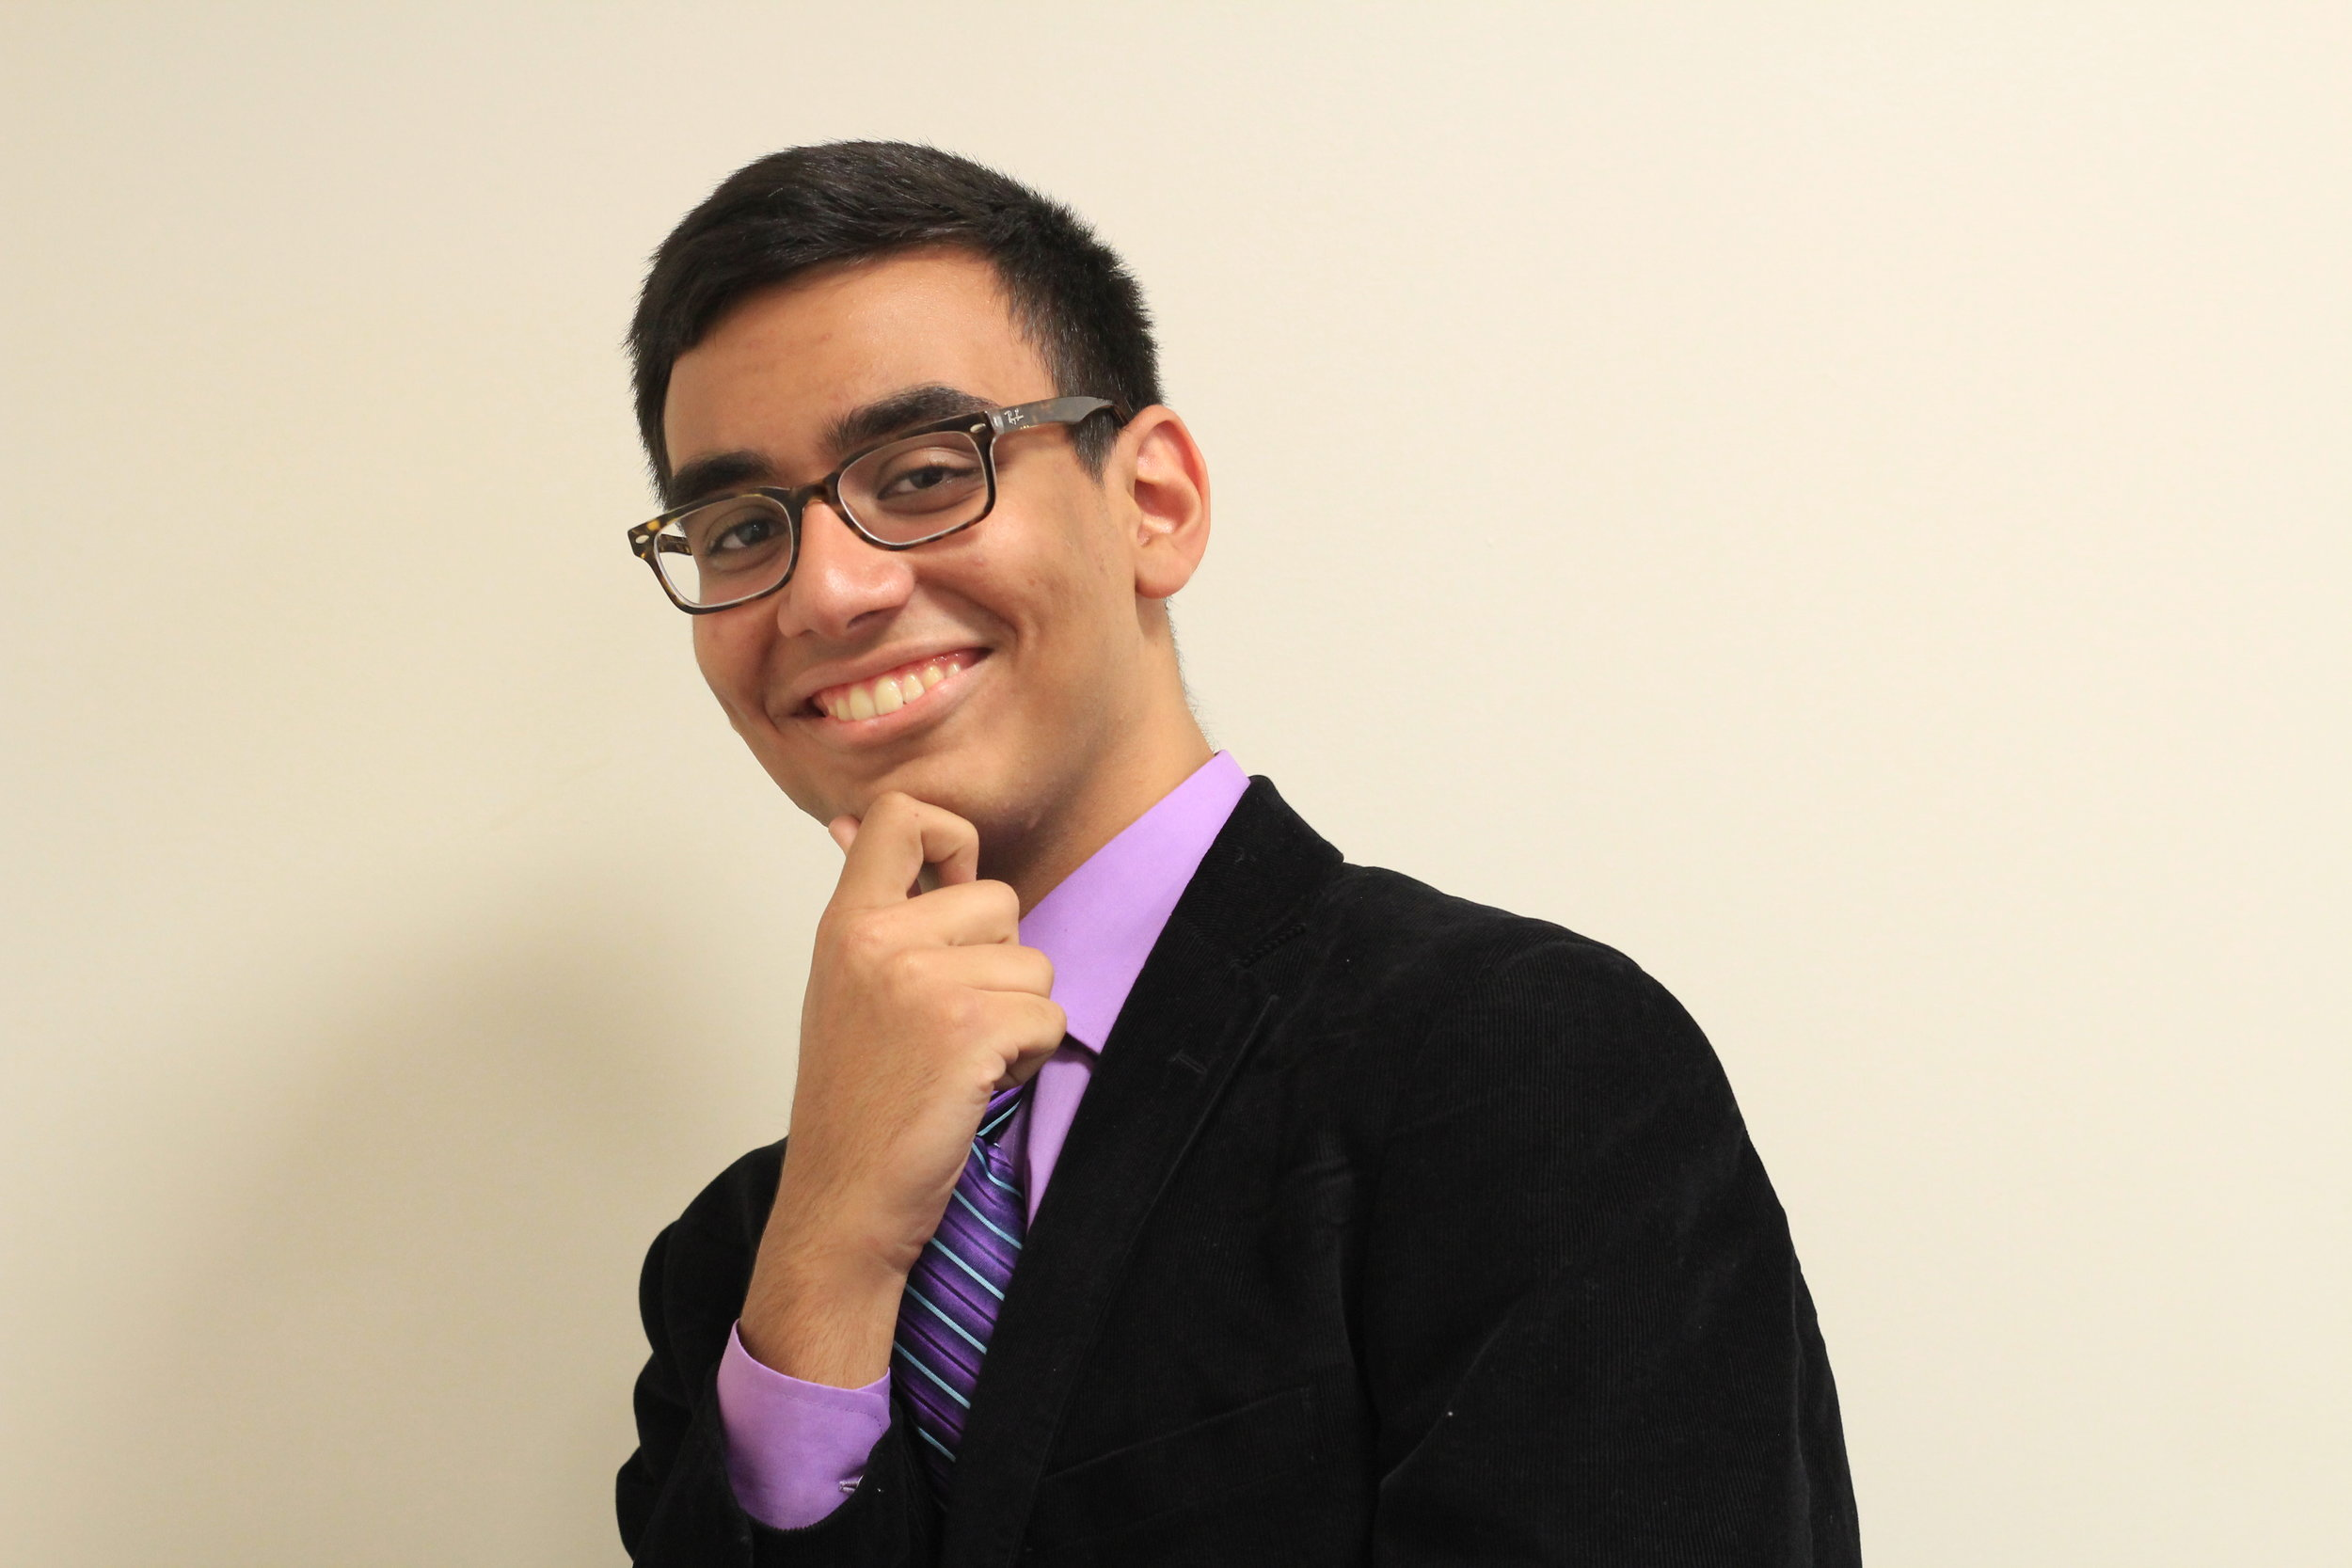 islam abdelmotaleb - RECRUITMENT COORDINATOR